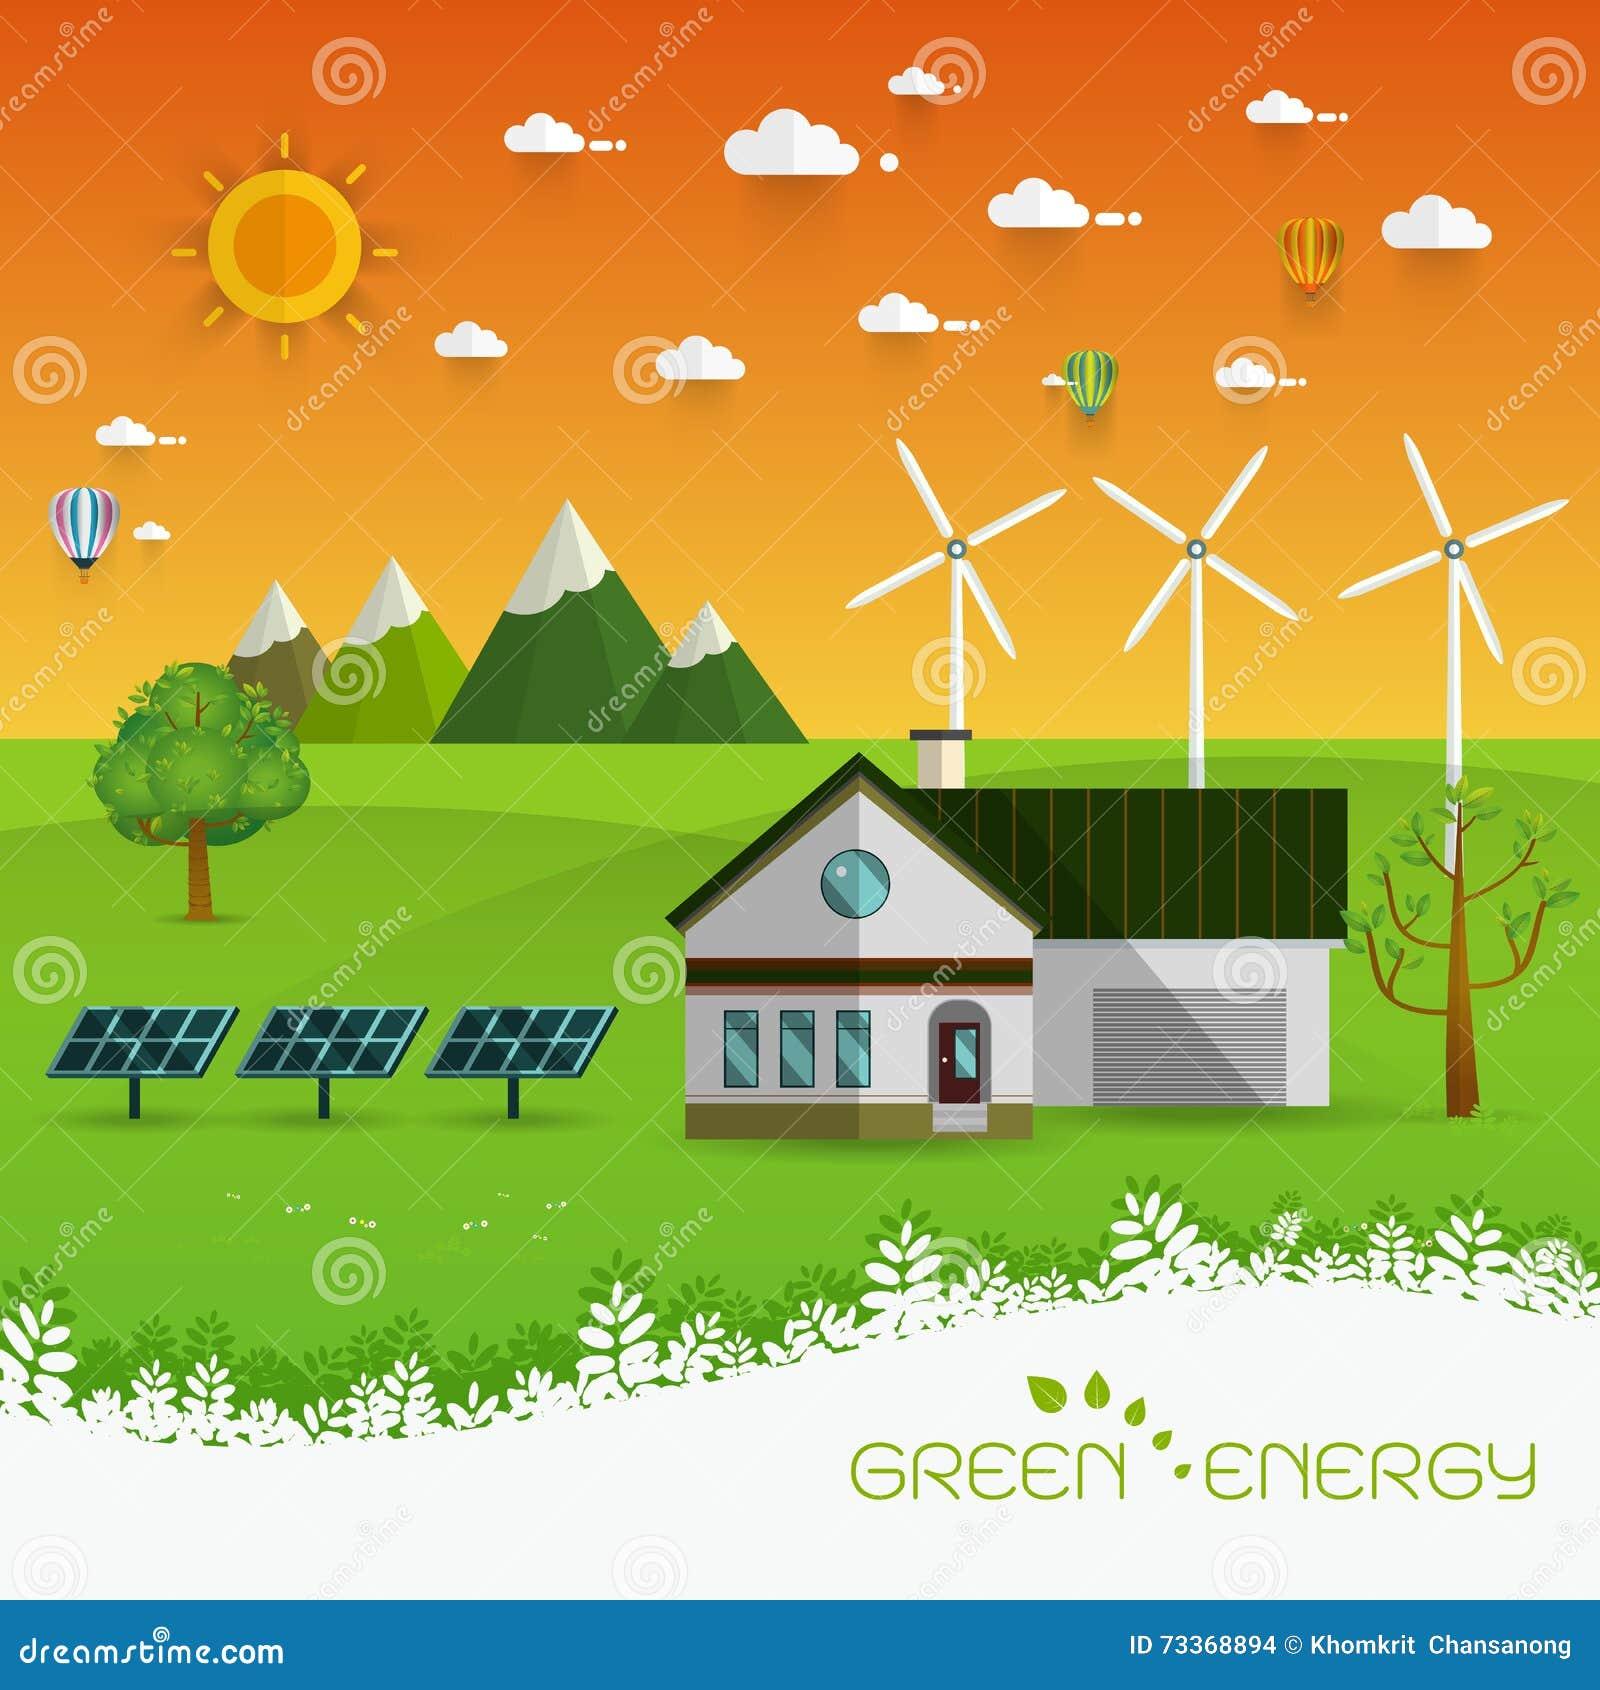 Environmental Concept Earthfriendly Landscapes: Eco Friendly House Stock Vector